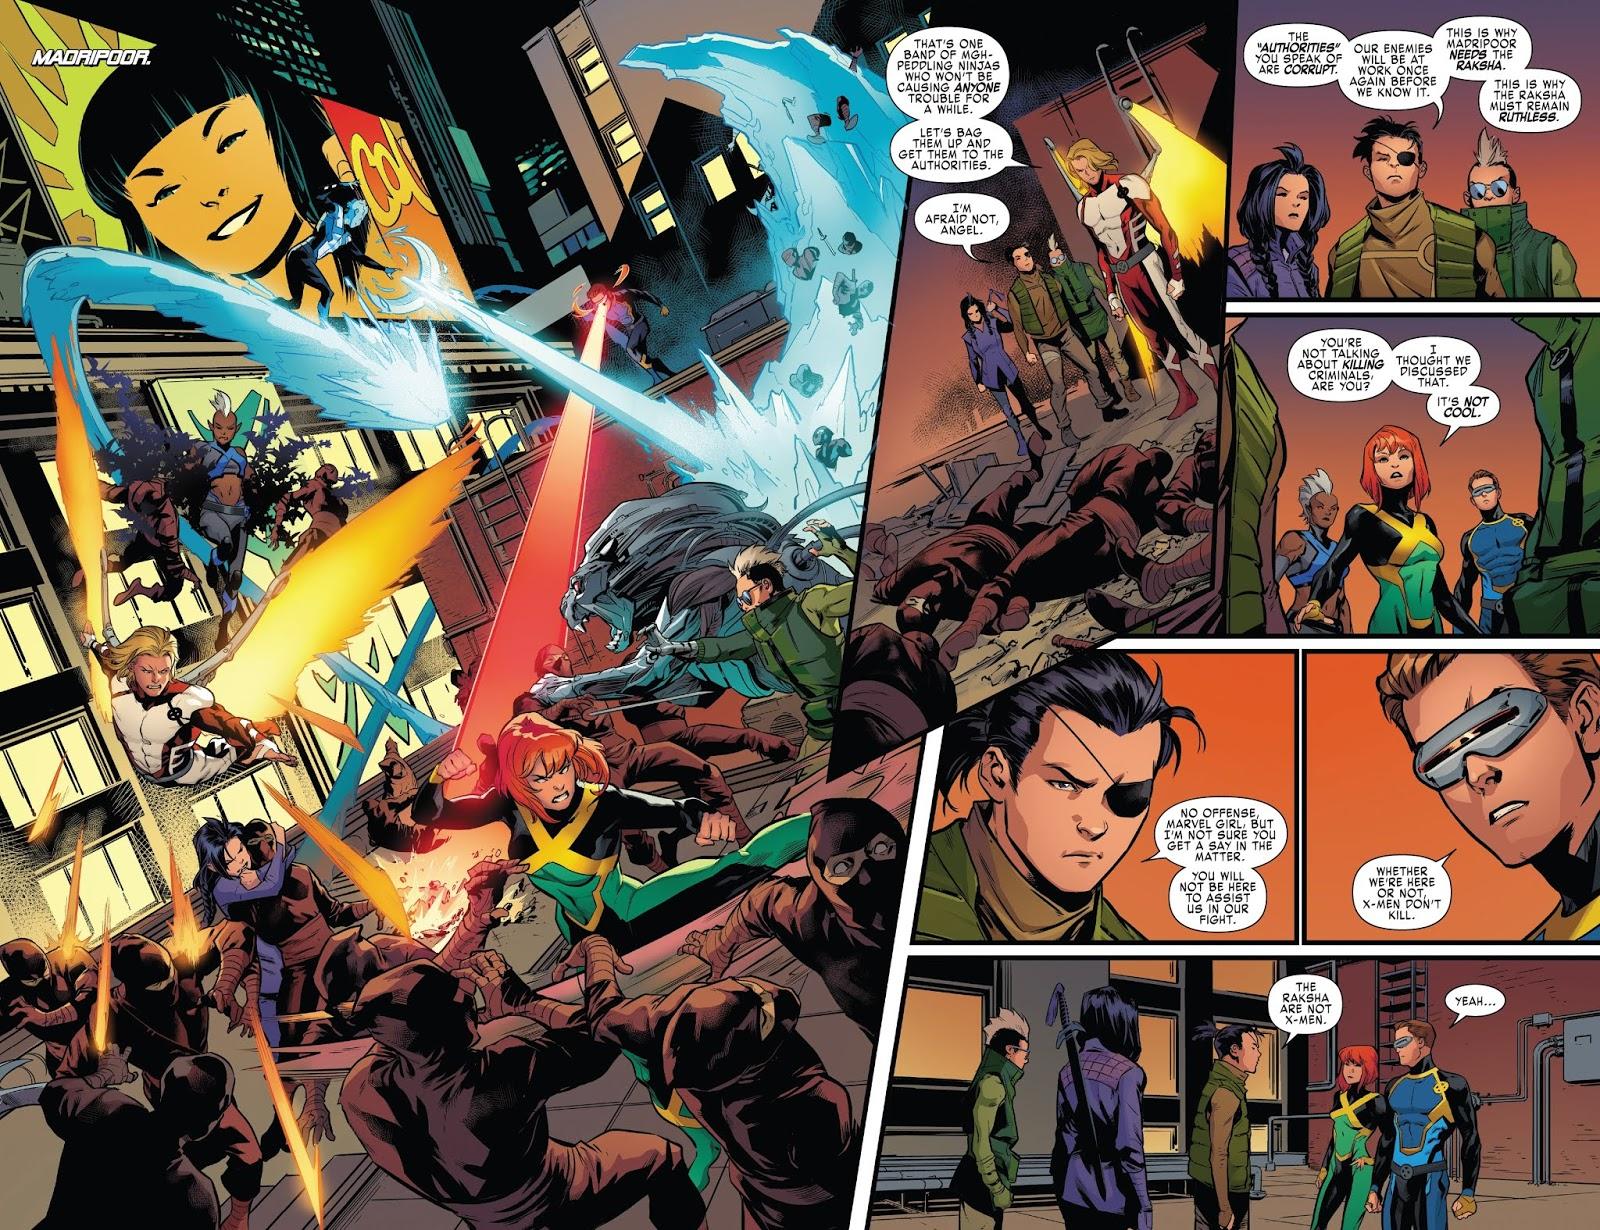 X-Men Blue Surviving the Experience review